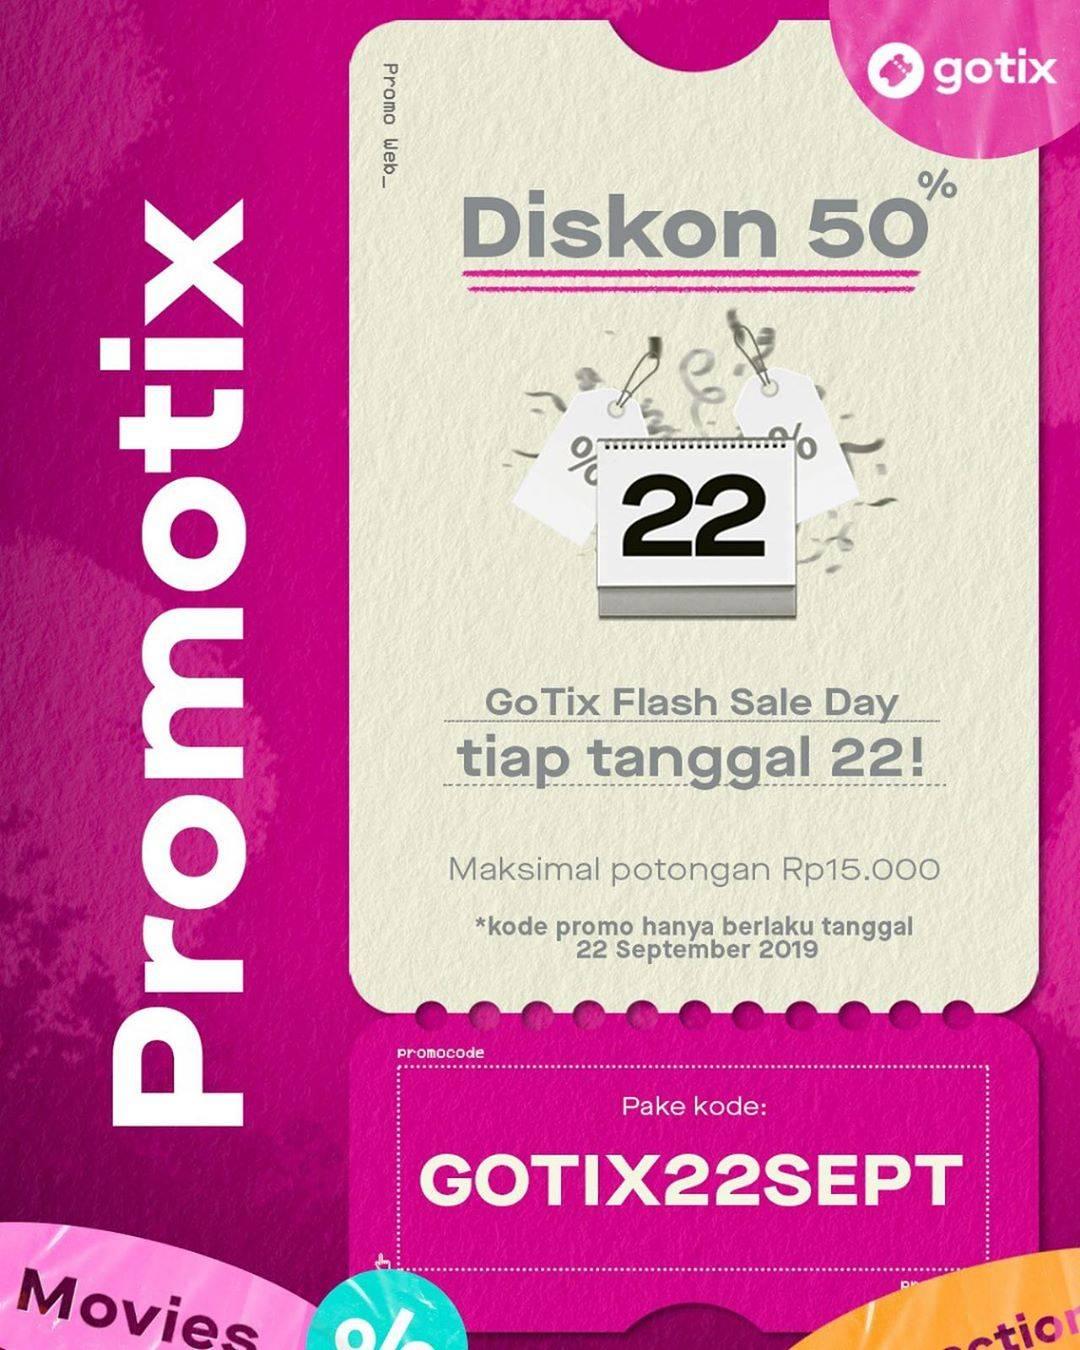 GOTIX FLASH SALE DAY! DISKON 50% untuk Tiket Nonton dan Tiket Tempat Wisata